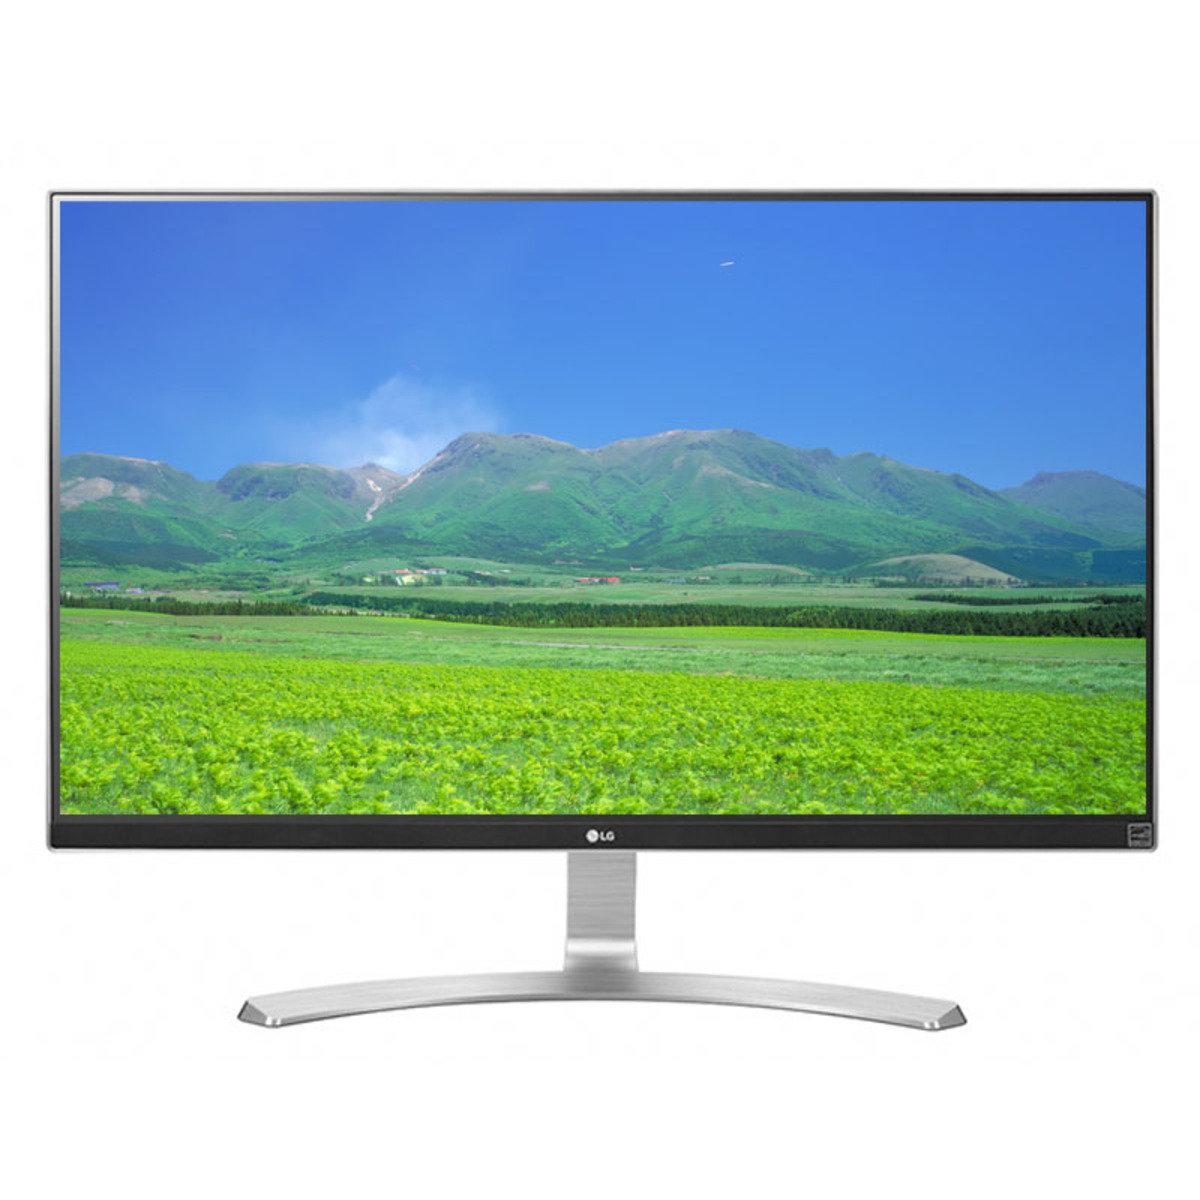 27吋 超高清 4K Free-Sync HDMI2.0 超薄邊顯示屏 27UD68